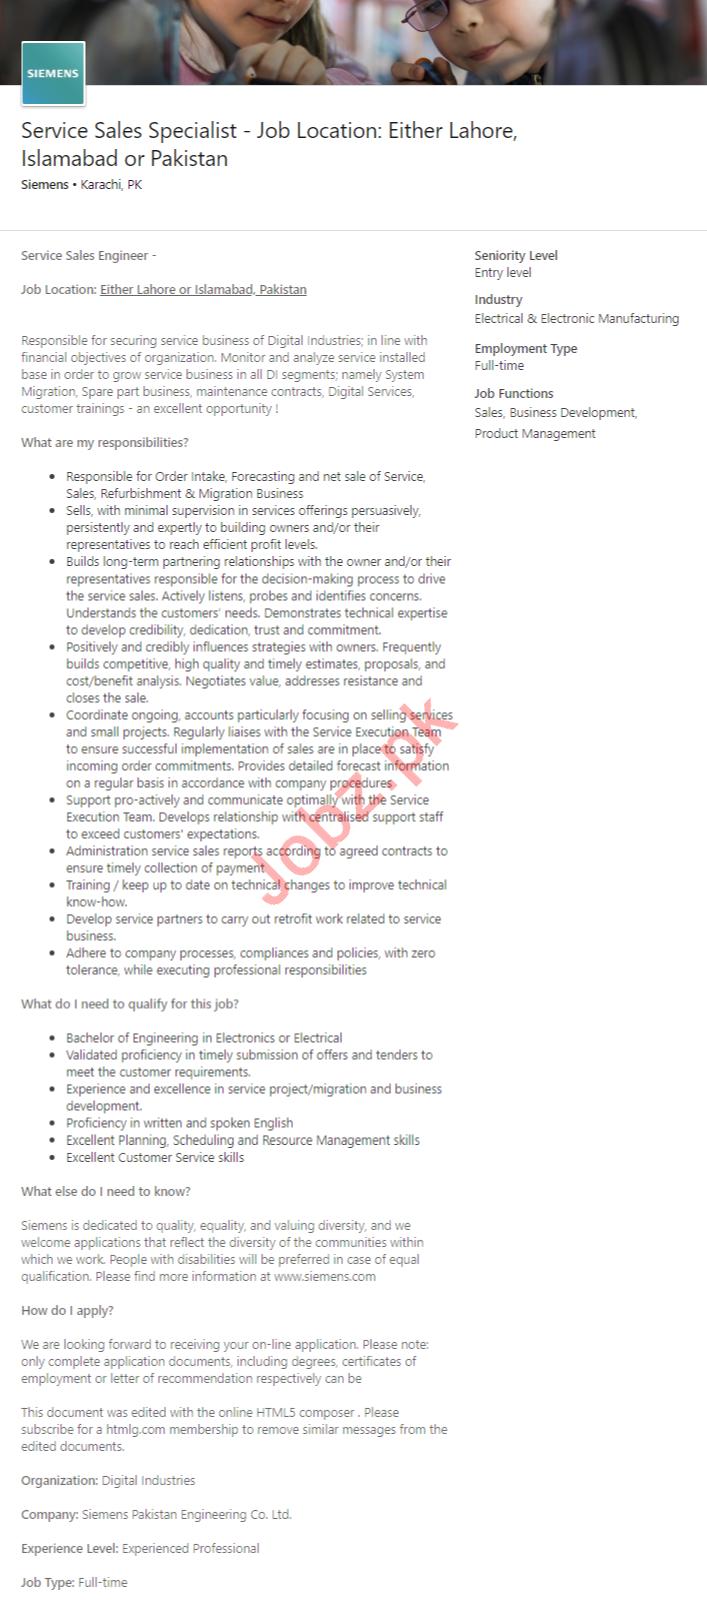 Siemens Pakistan Jobs 2020 for Service Sales Specialist